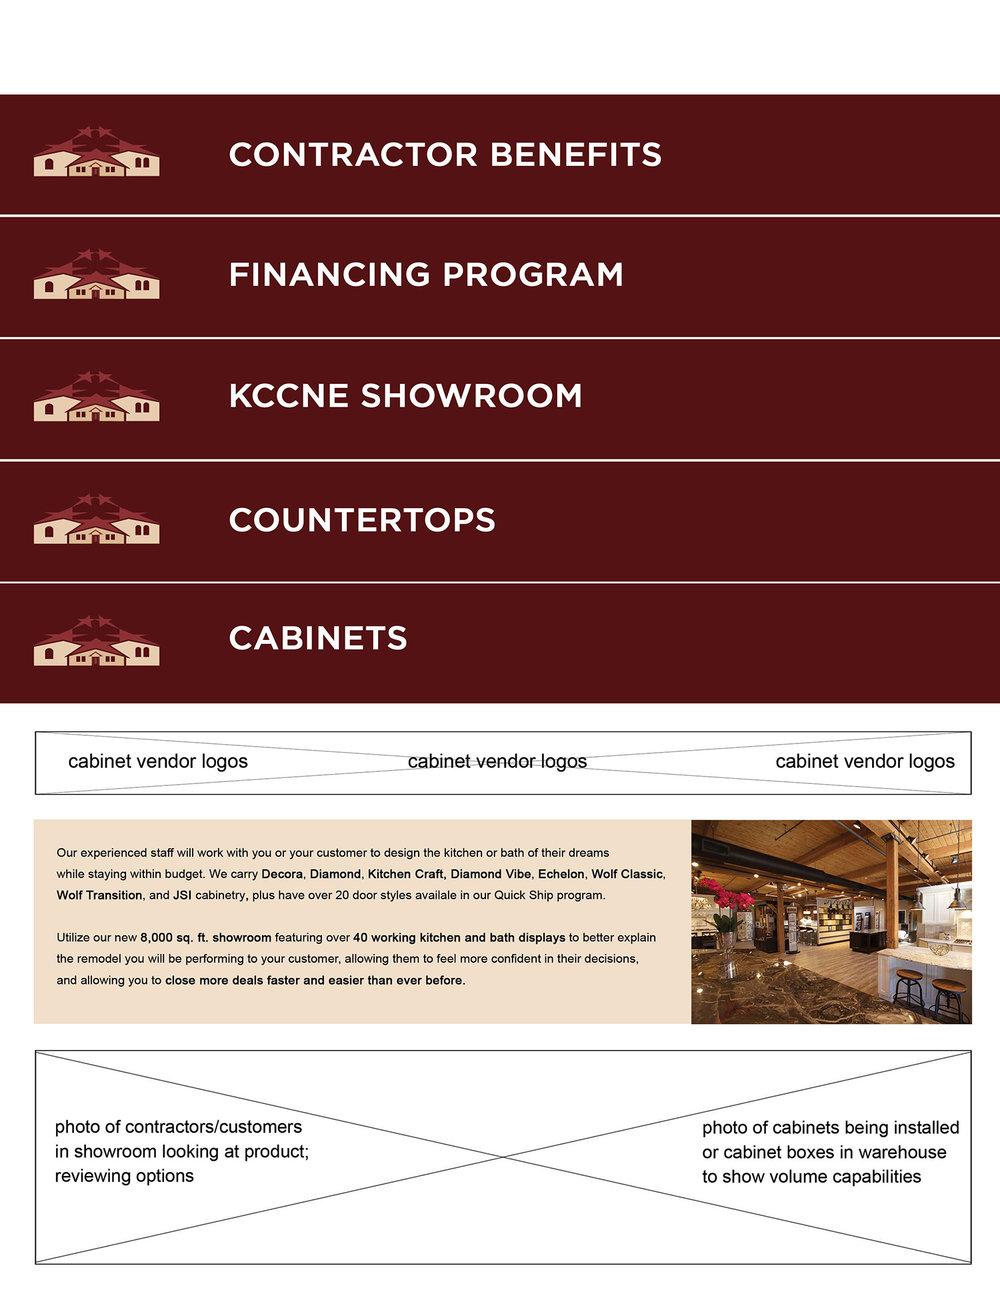 1-LAYOUT-cabinets.jpg